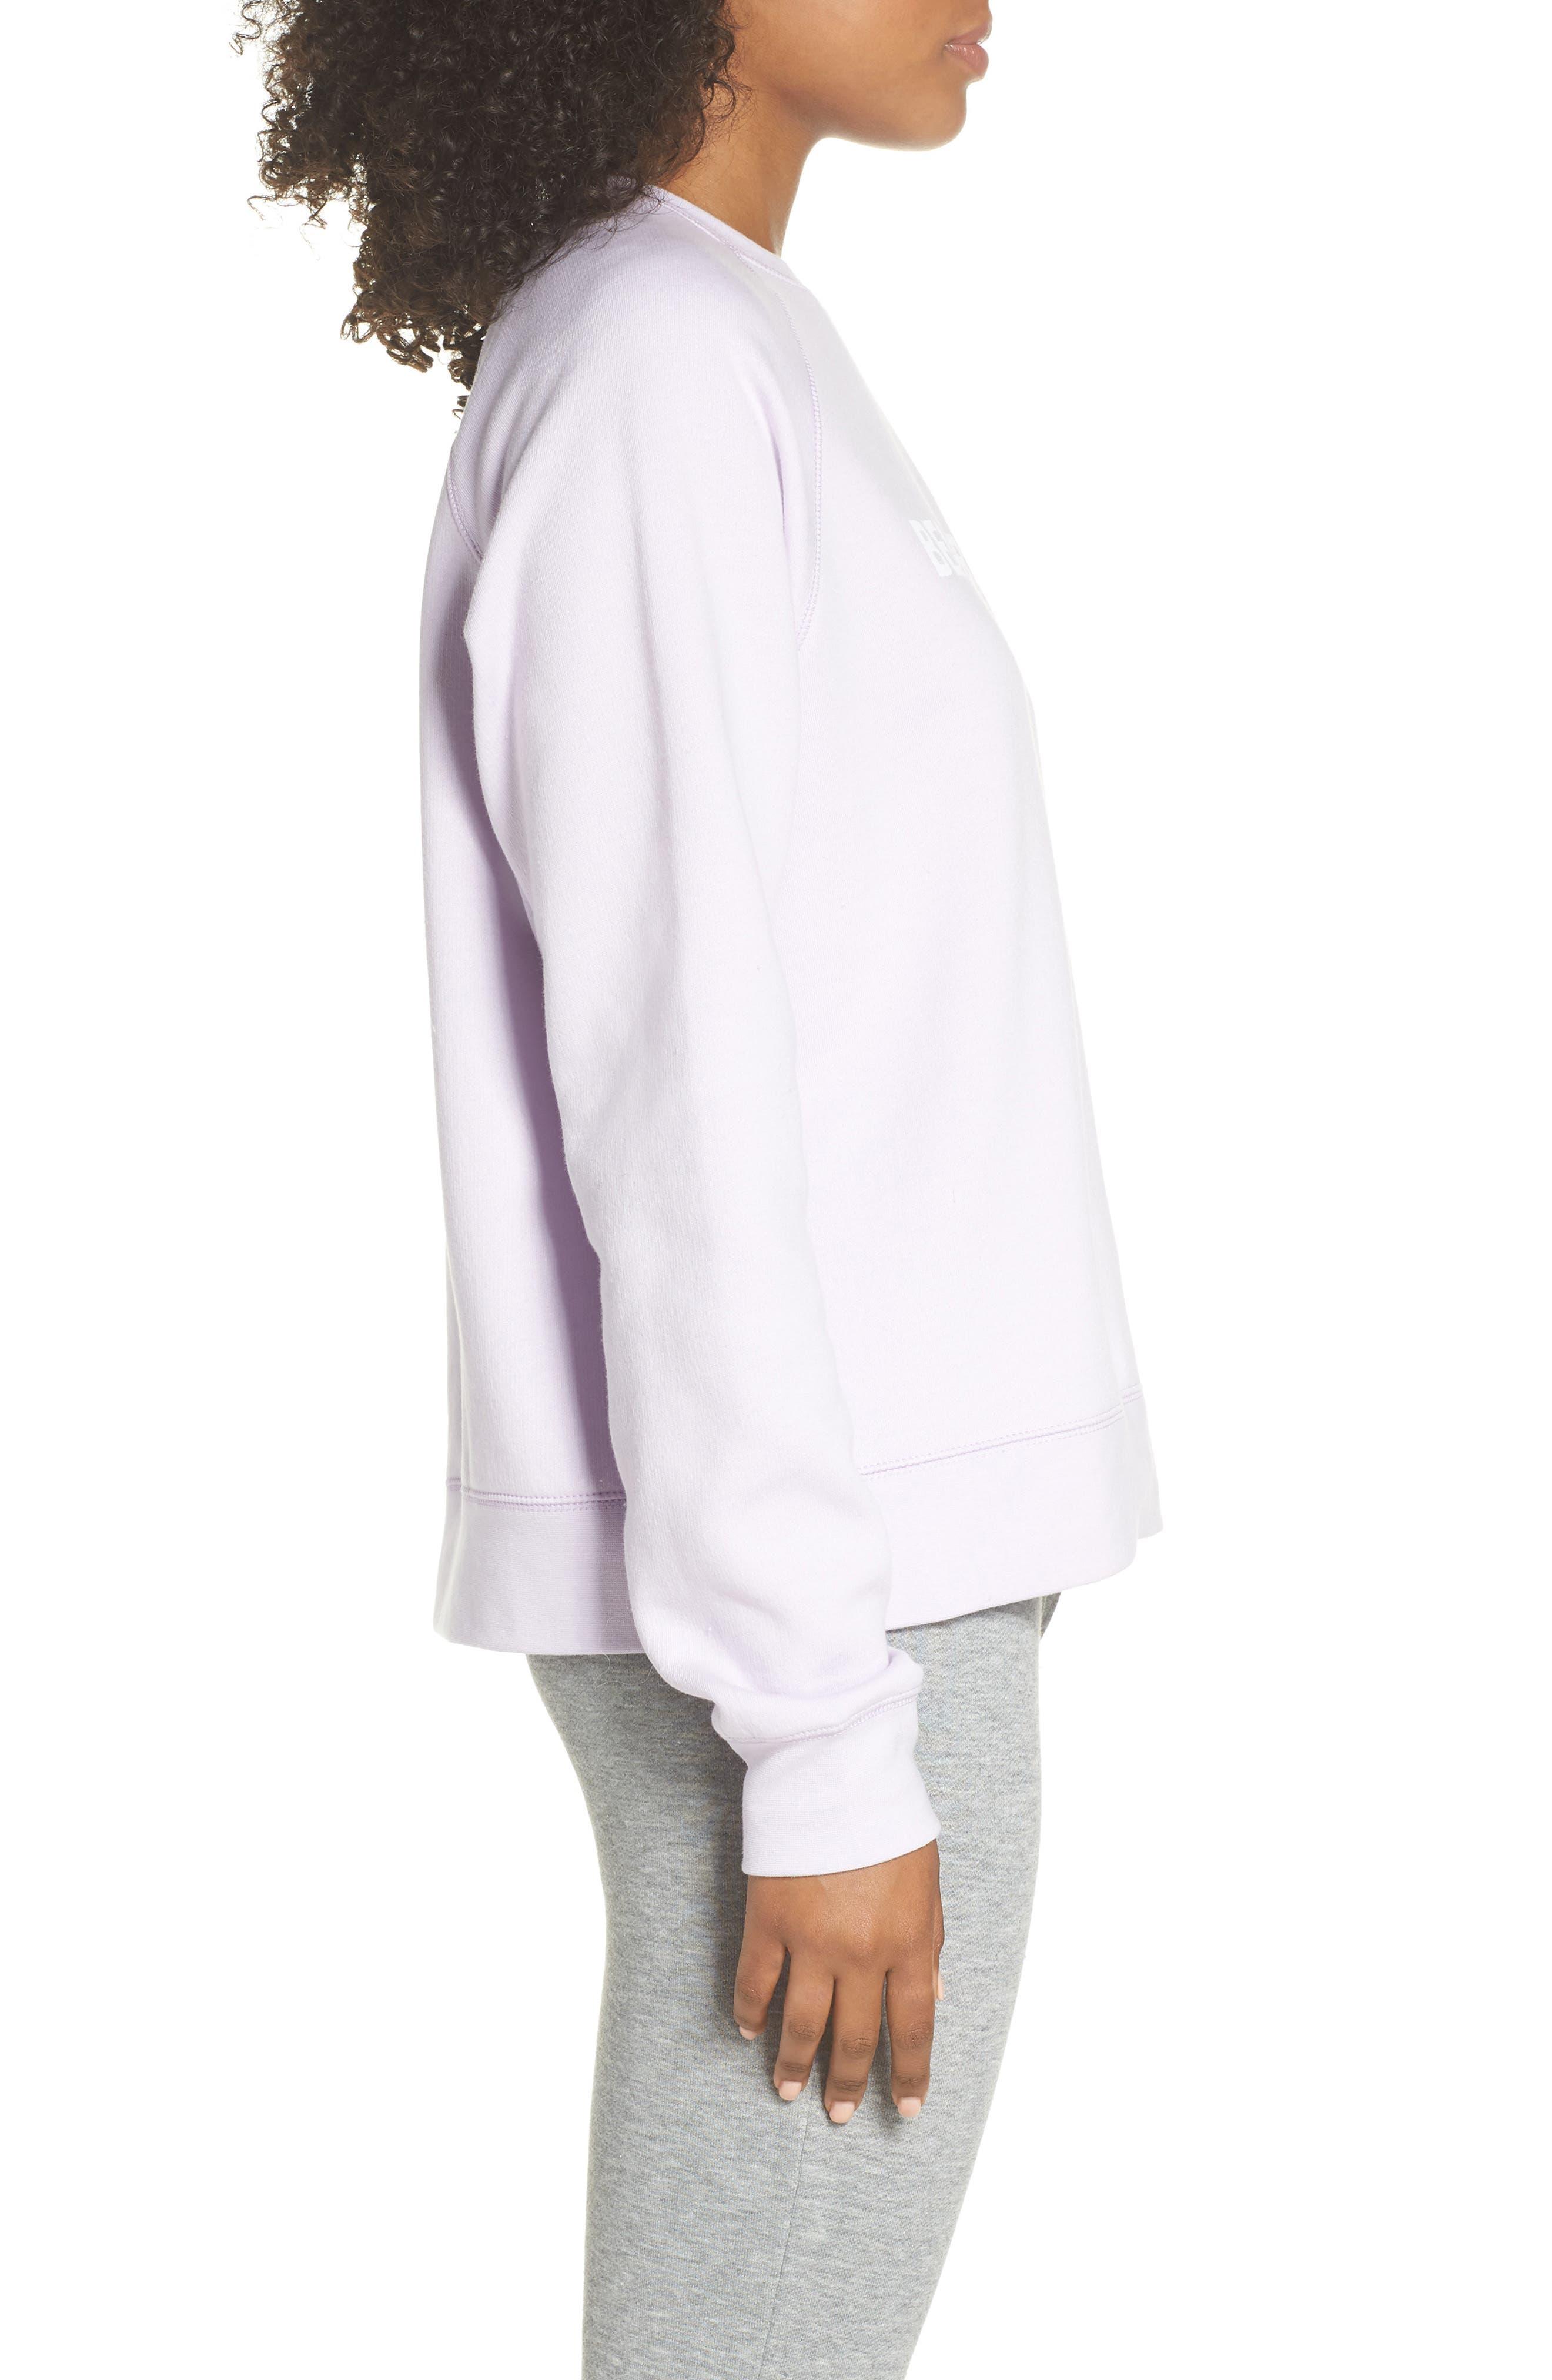 Beach Babe Middle Sister Crewneck Sweatshirt,                             Alternate thumbnail 3, color,                             Soft Lavender